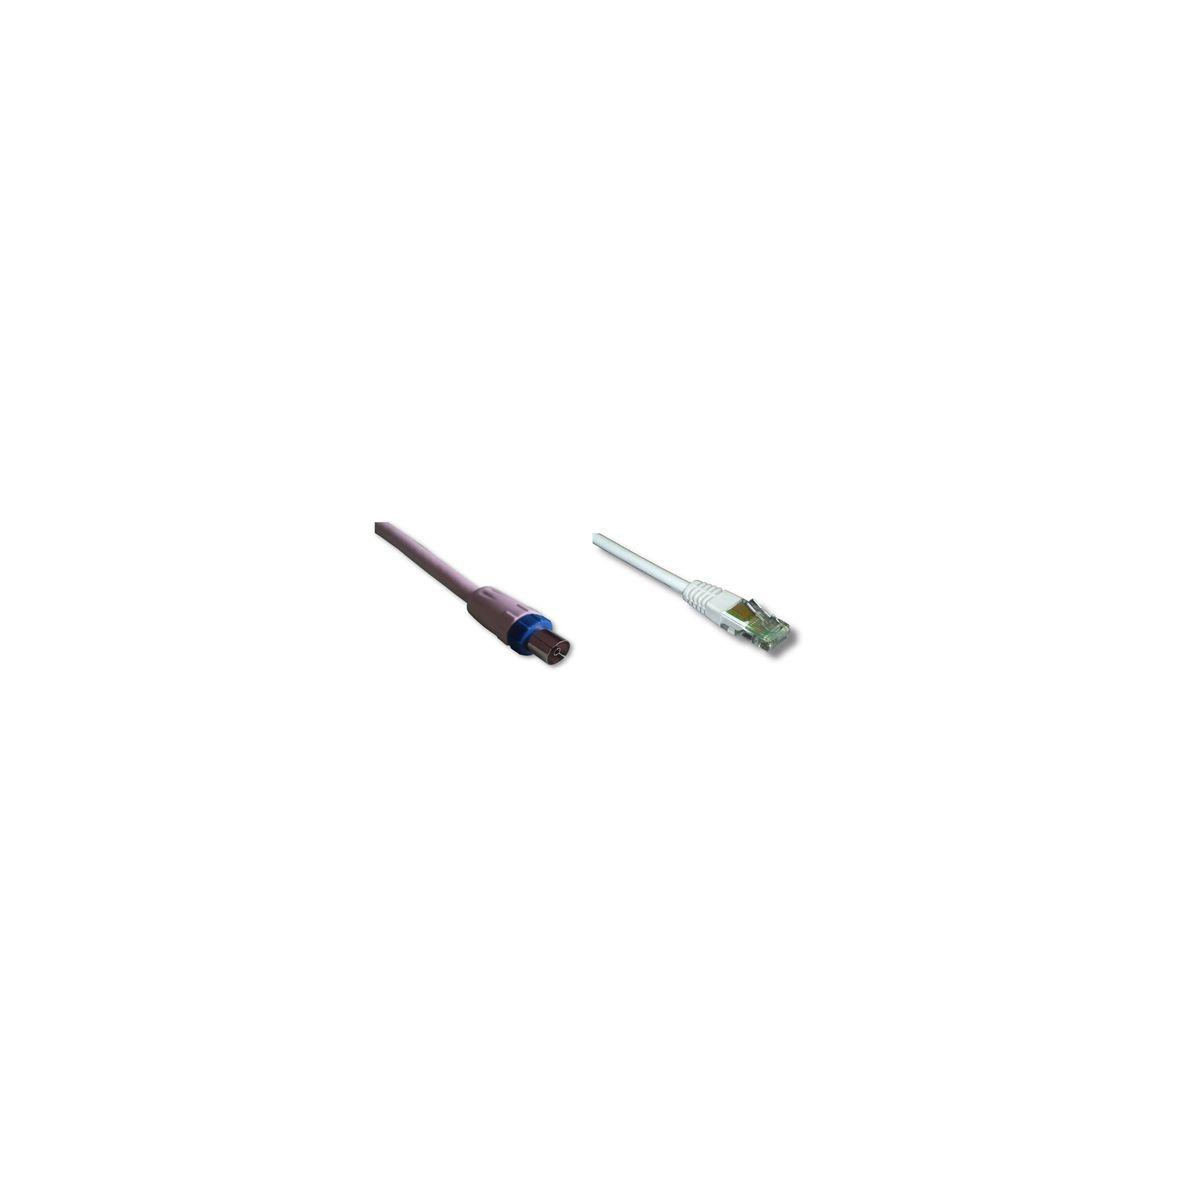 Coaxial sc mâle 9,52 mm / rj45 mâle (photo)